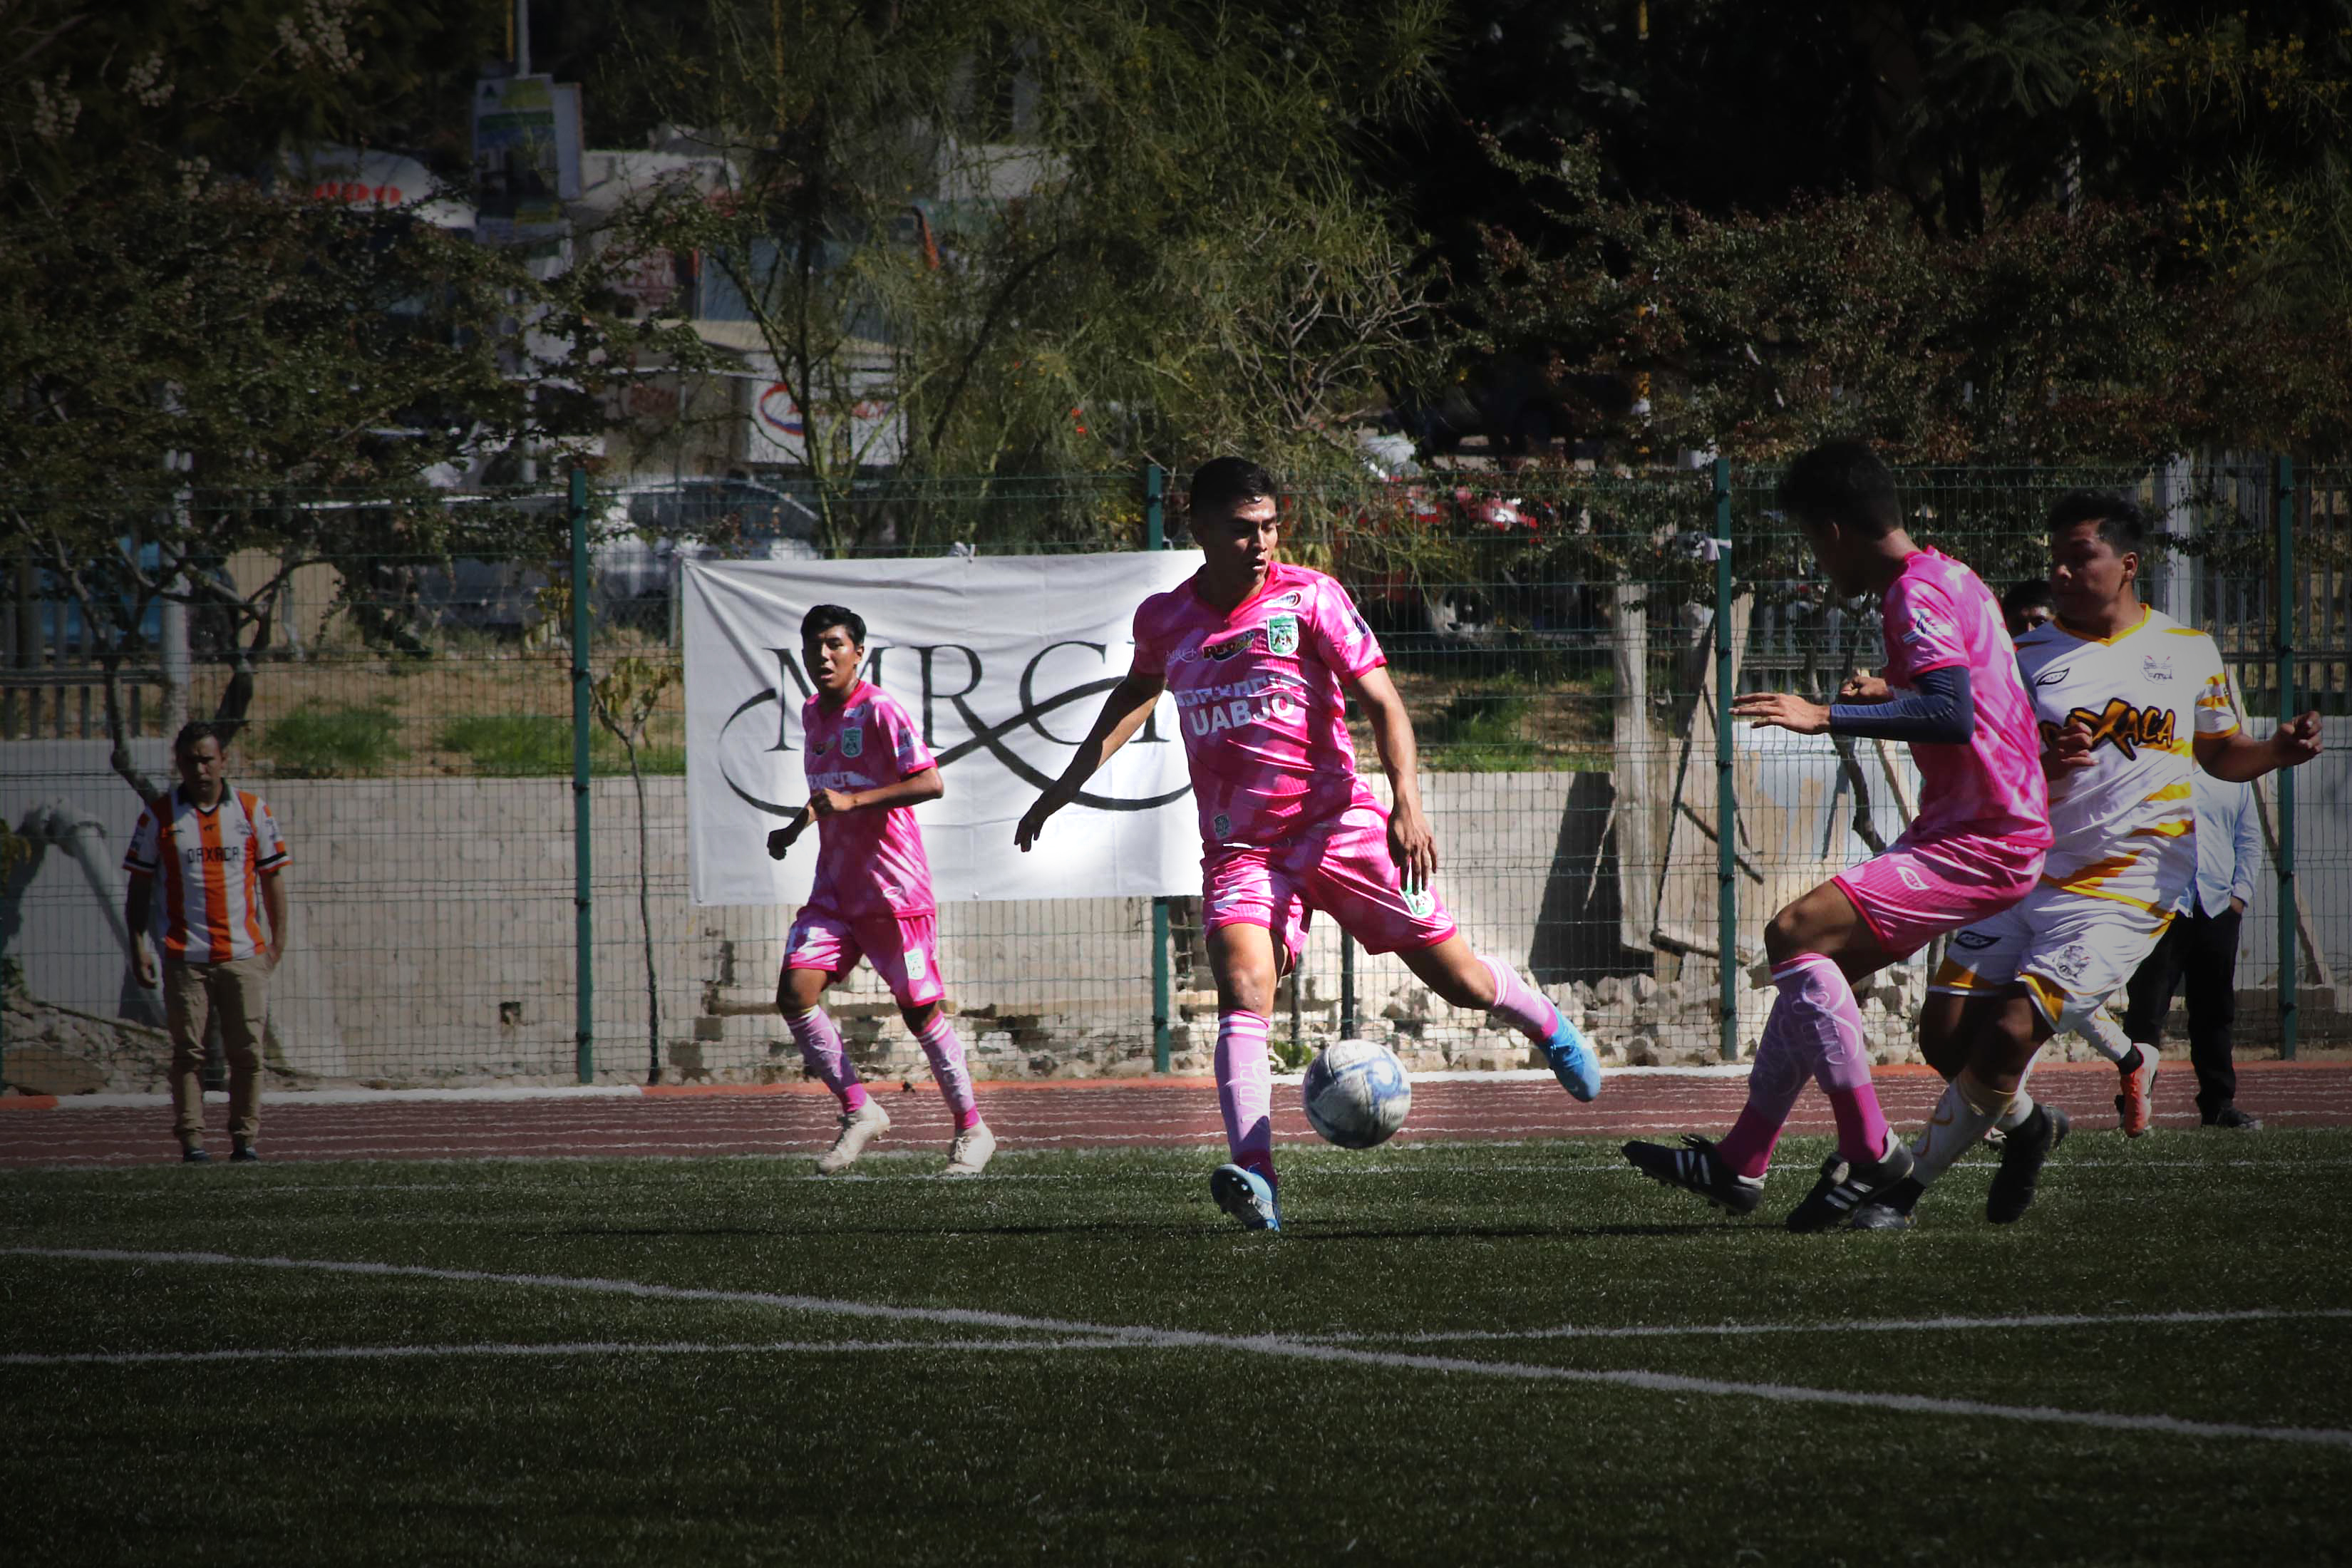 Equipo futbol Gavilanes UABJO